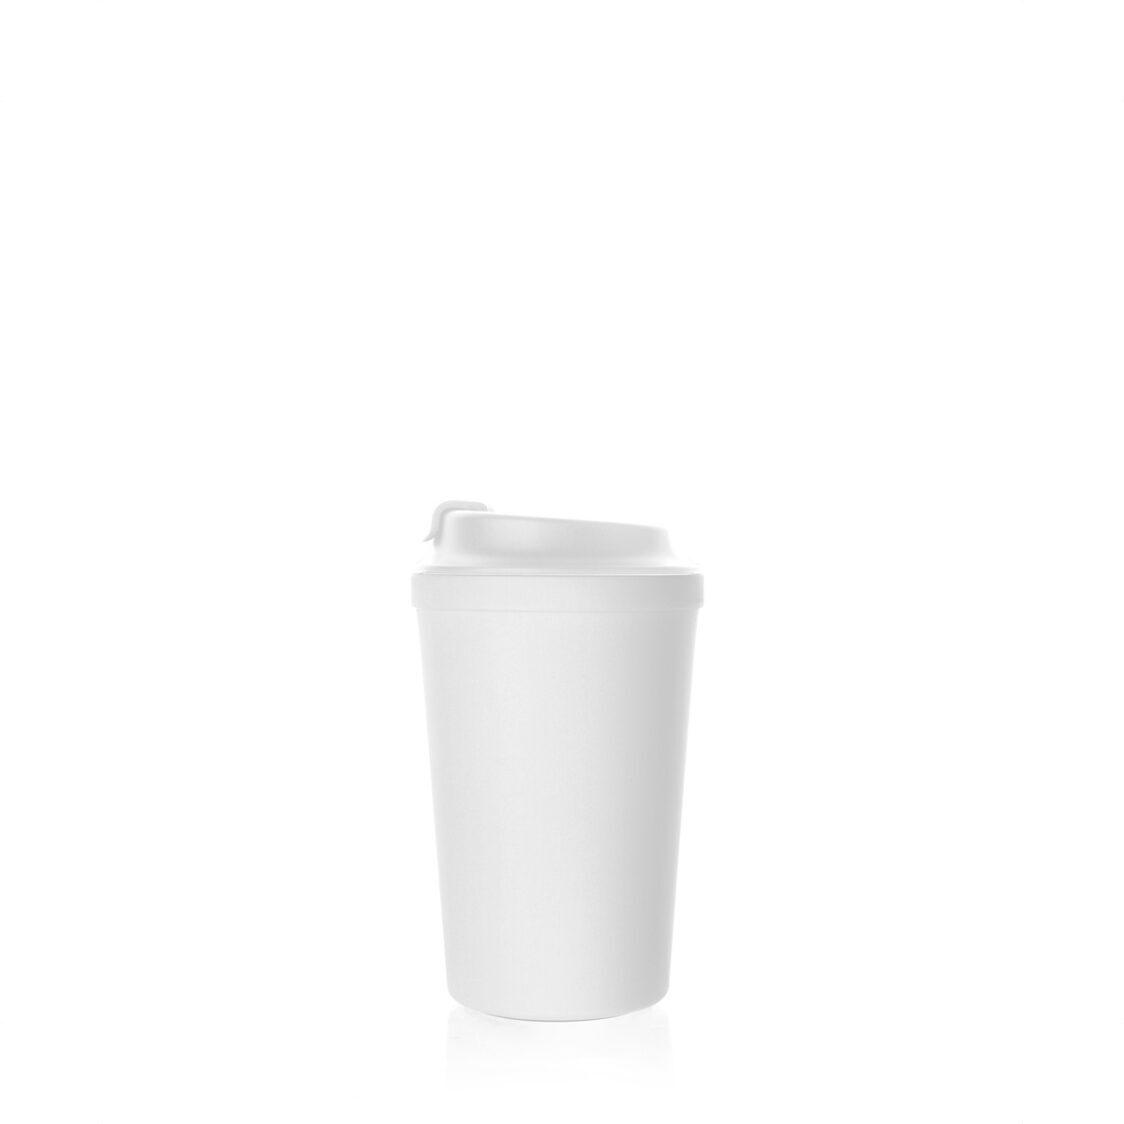 Artiart Suction Idea Caf Mug Solar White 340ml